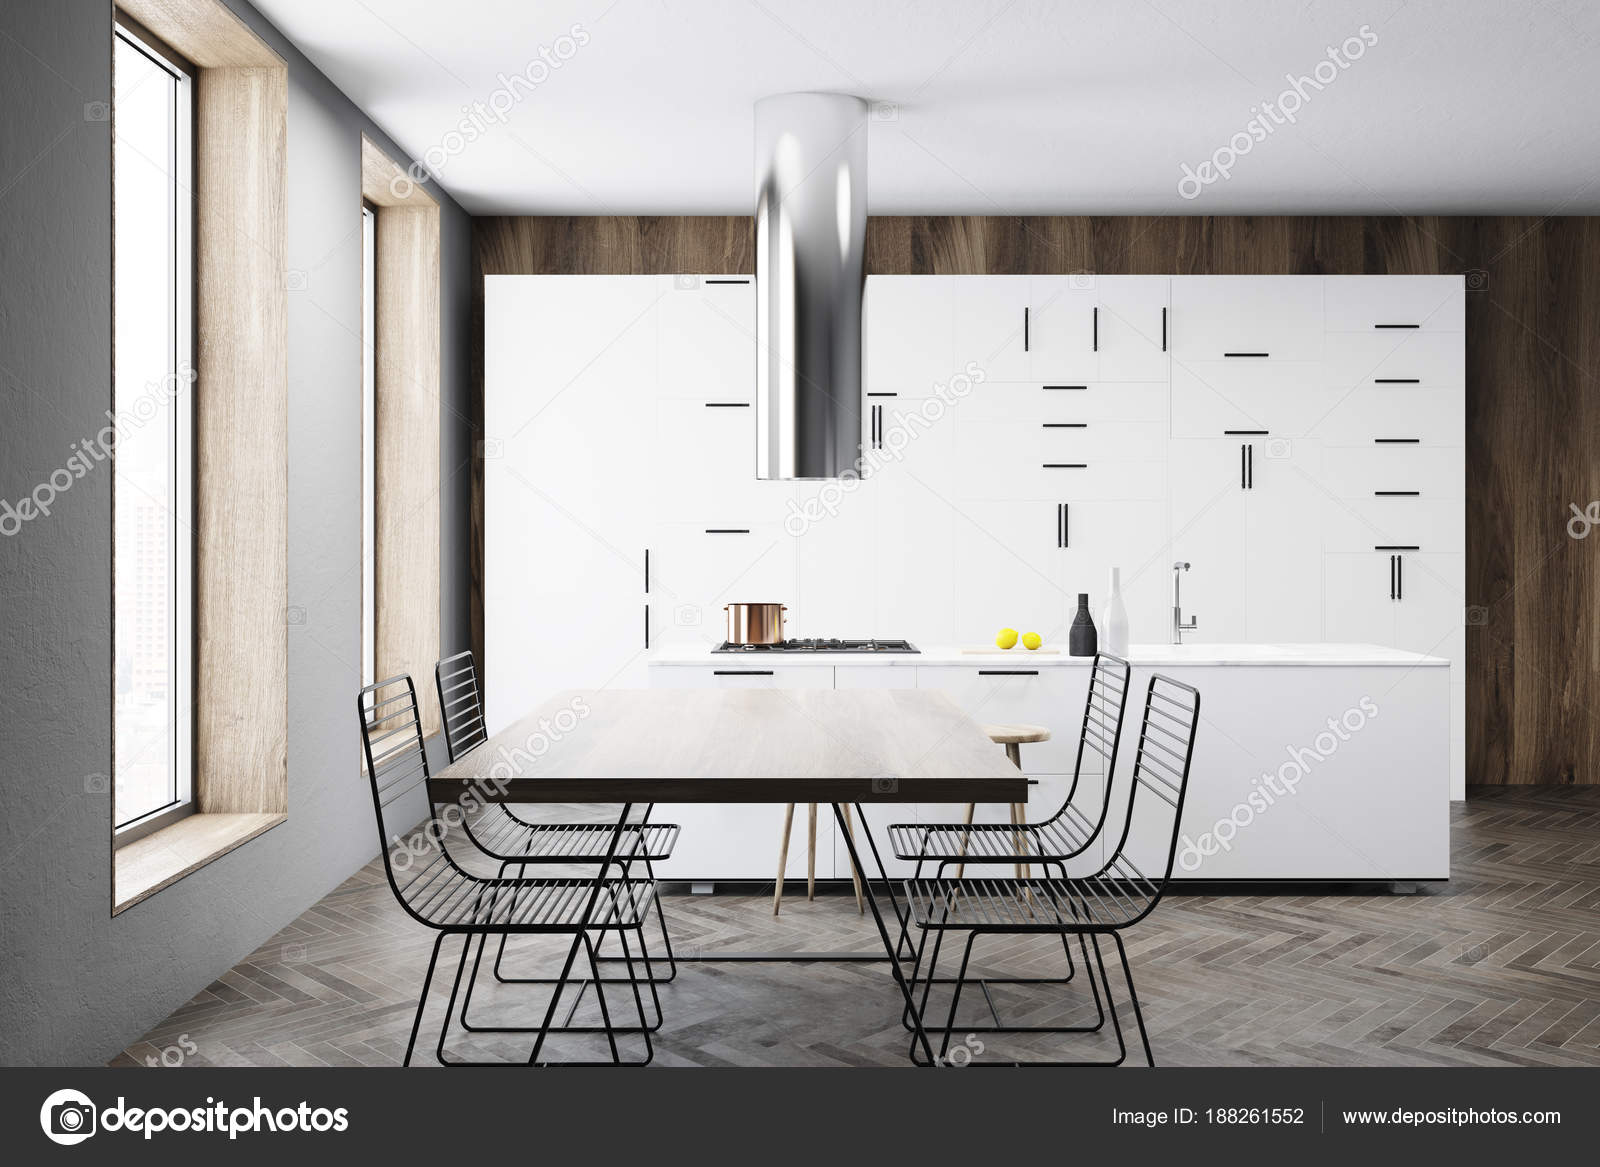 pub kitchen table decorations ideas 白色厨房内饰 酒吧和桌子 图库照片 c denisismagilov 188261552